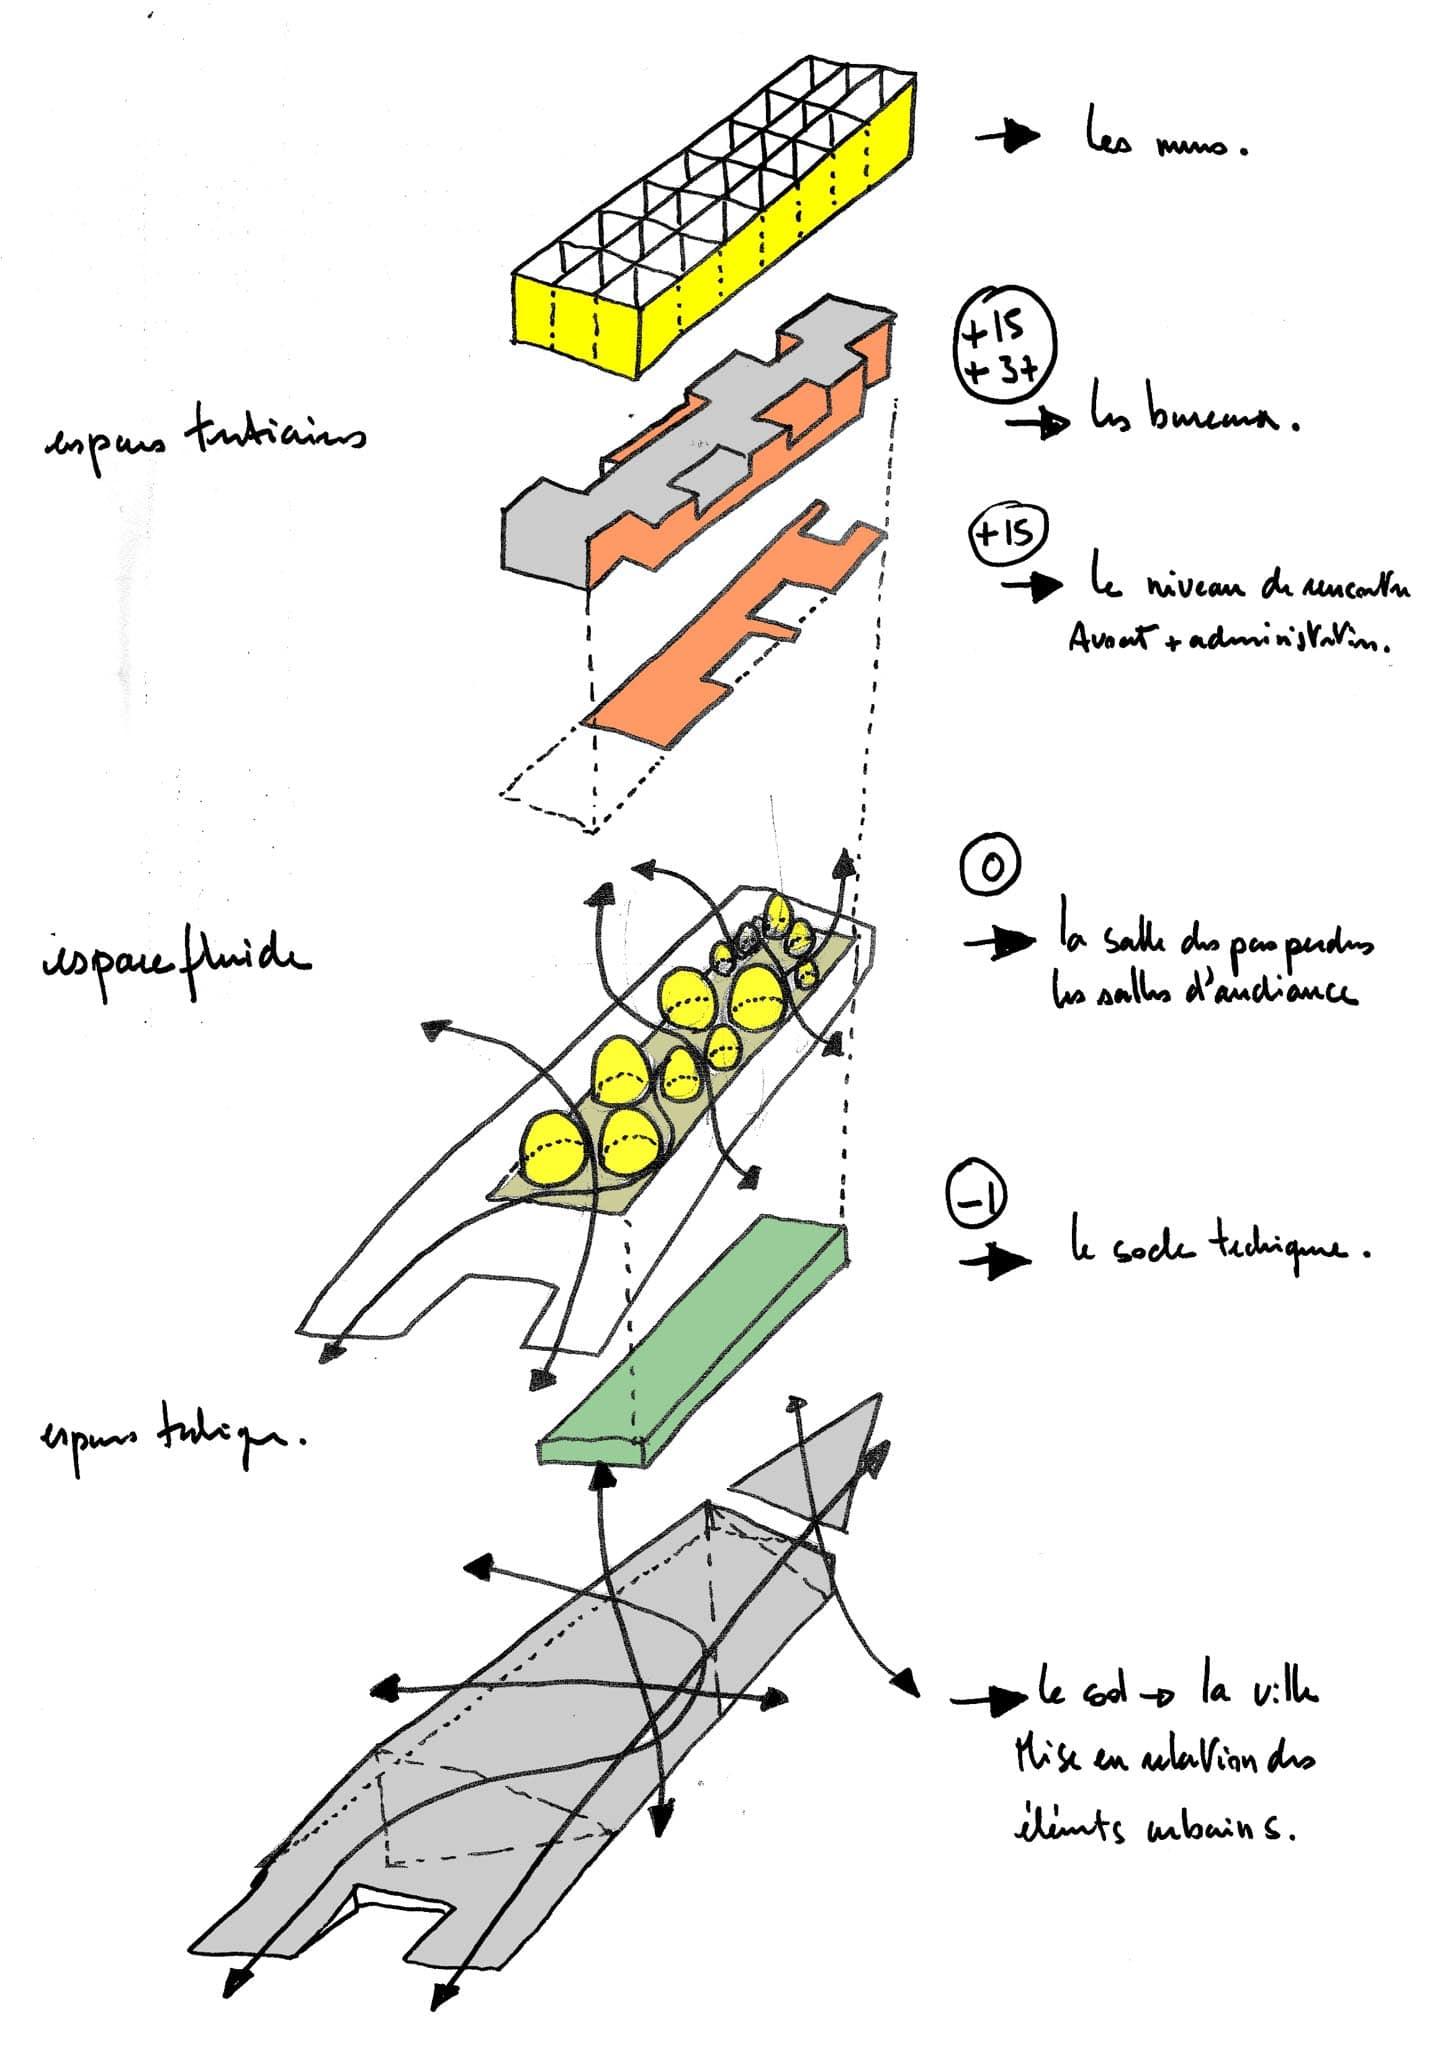 PARIS TRIBUNAL DE GRANDE INSTANCE